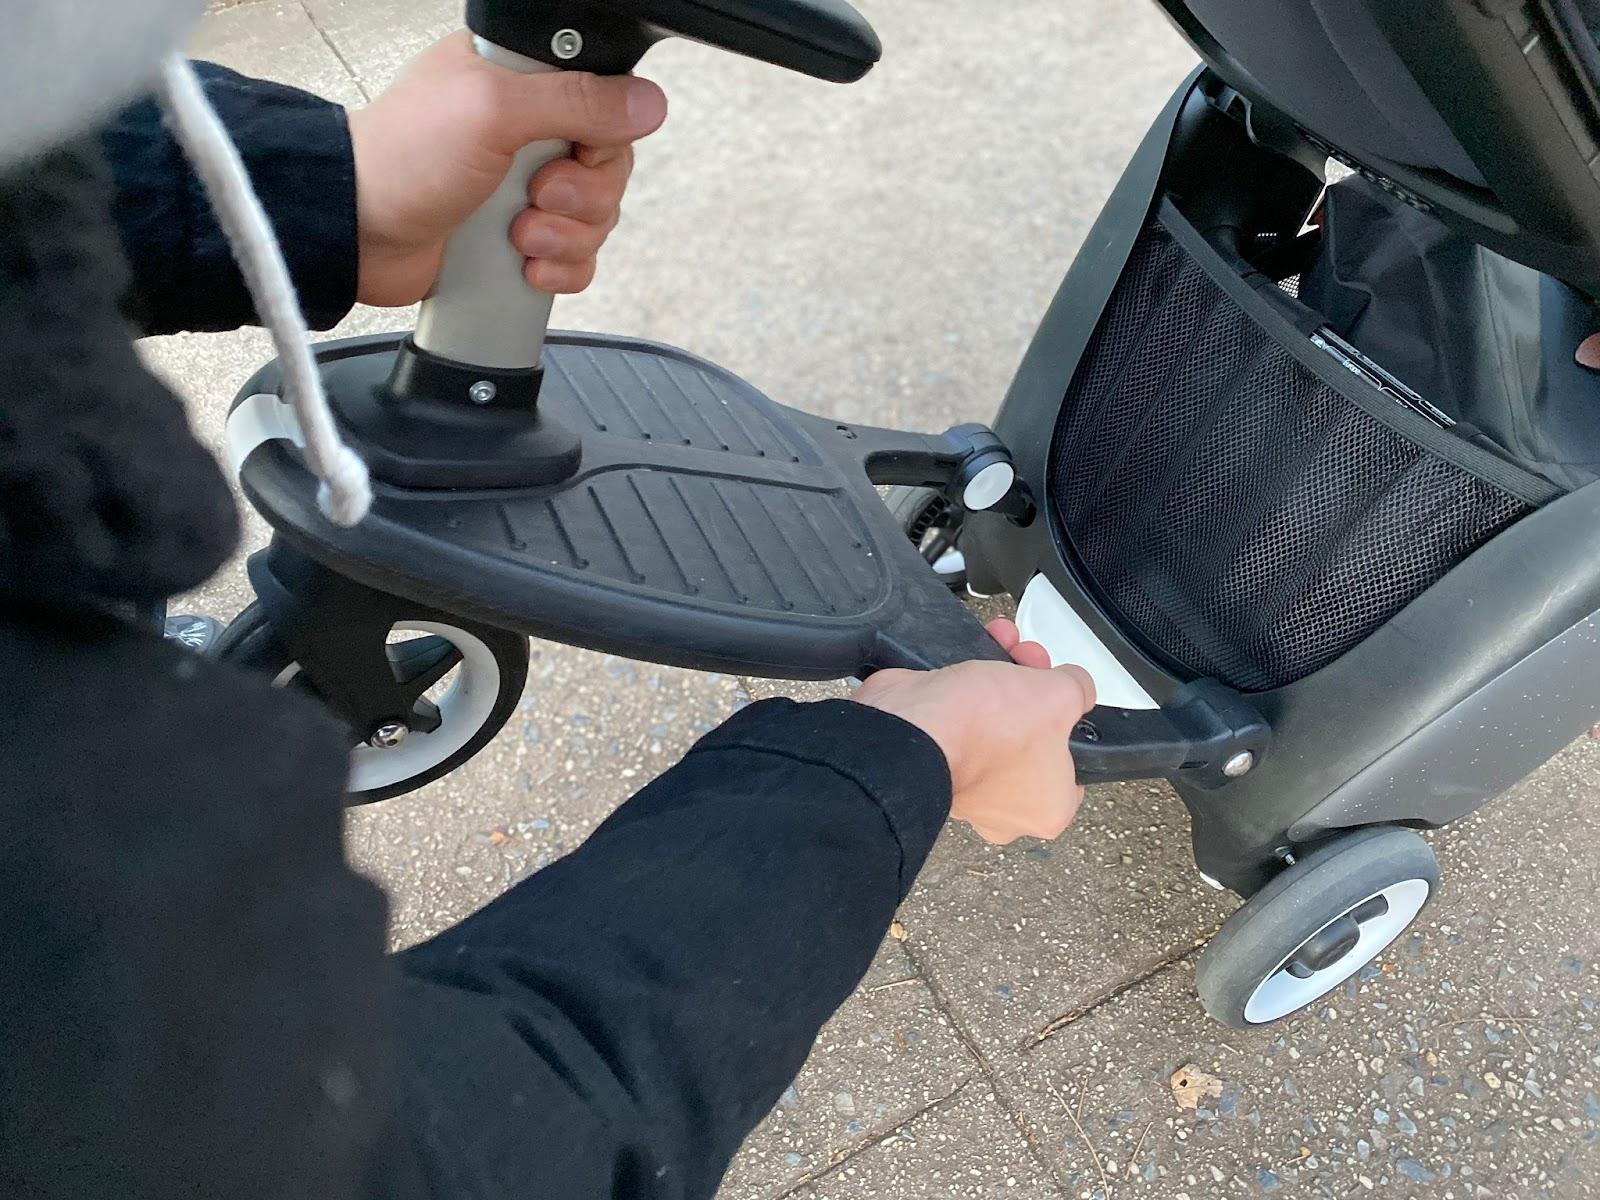 bugaboo ant stroller review: stroller board